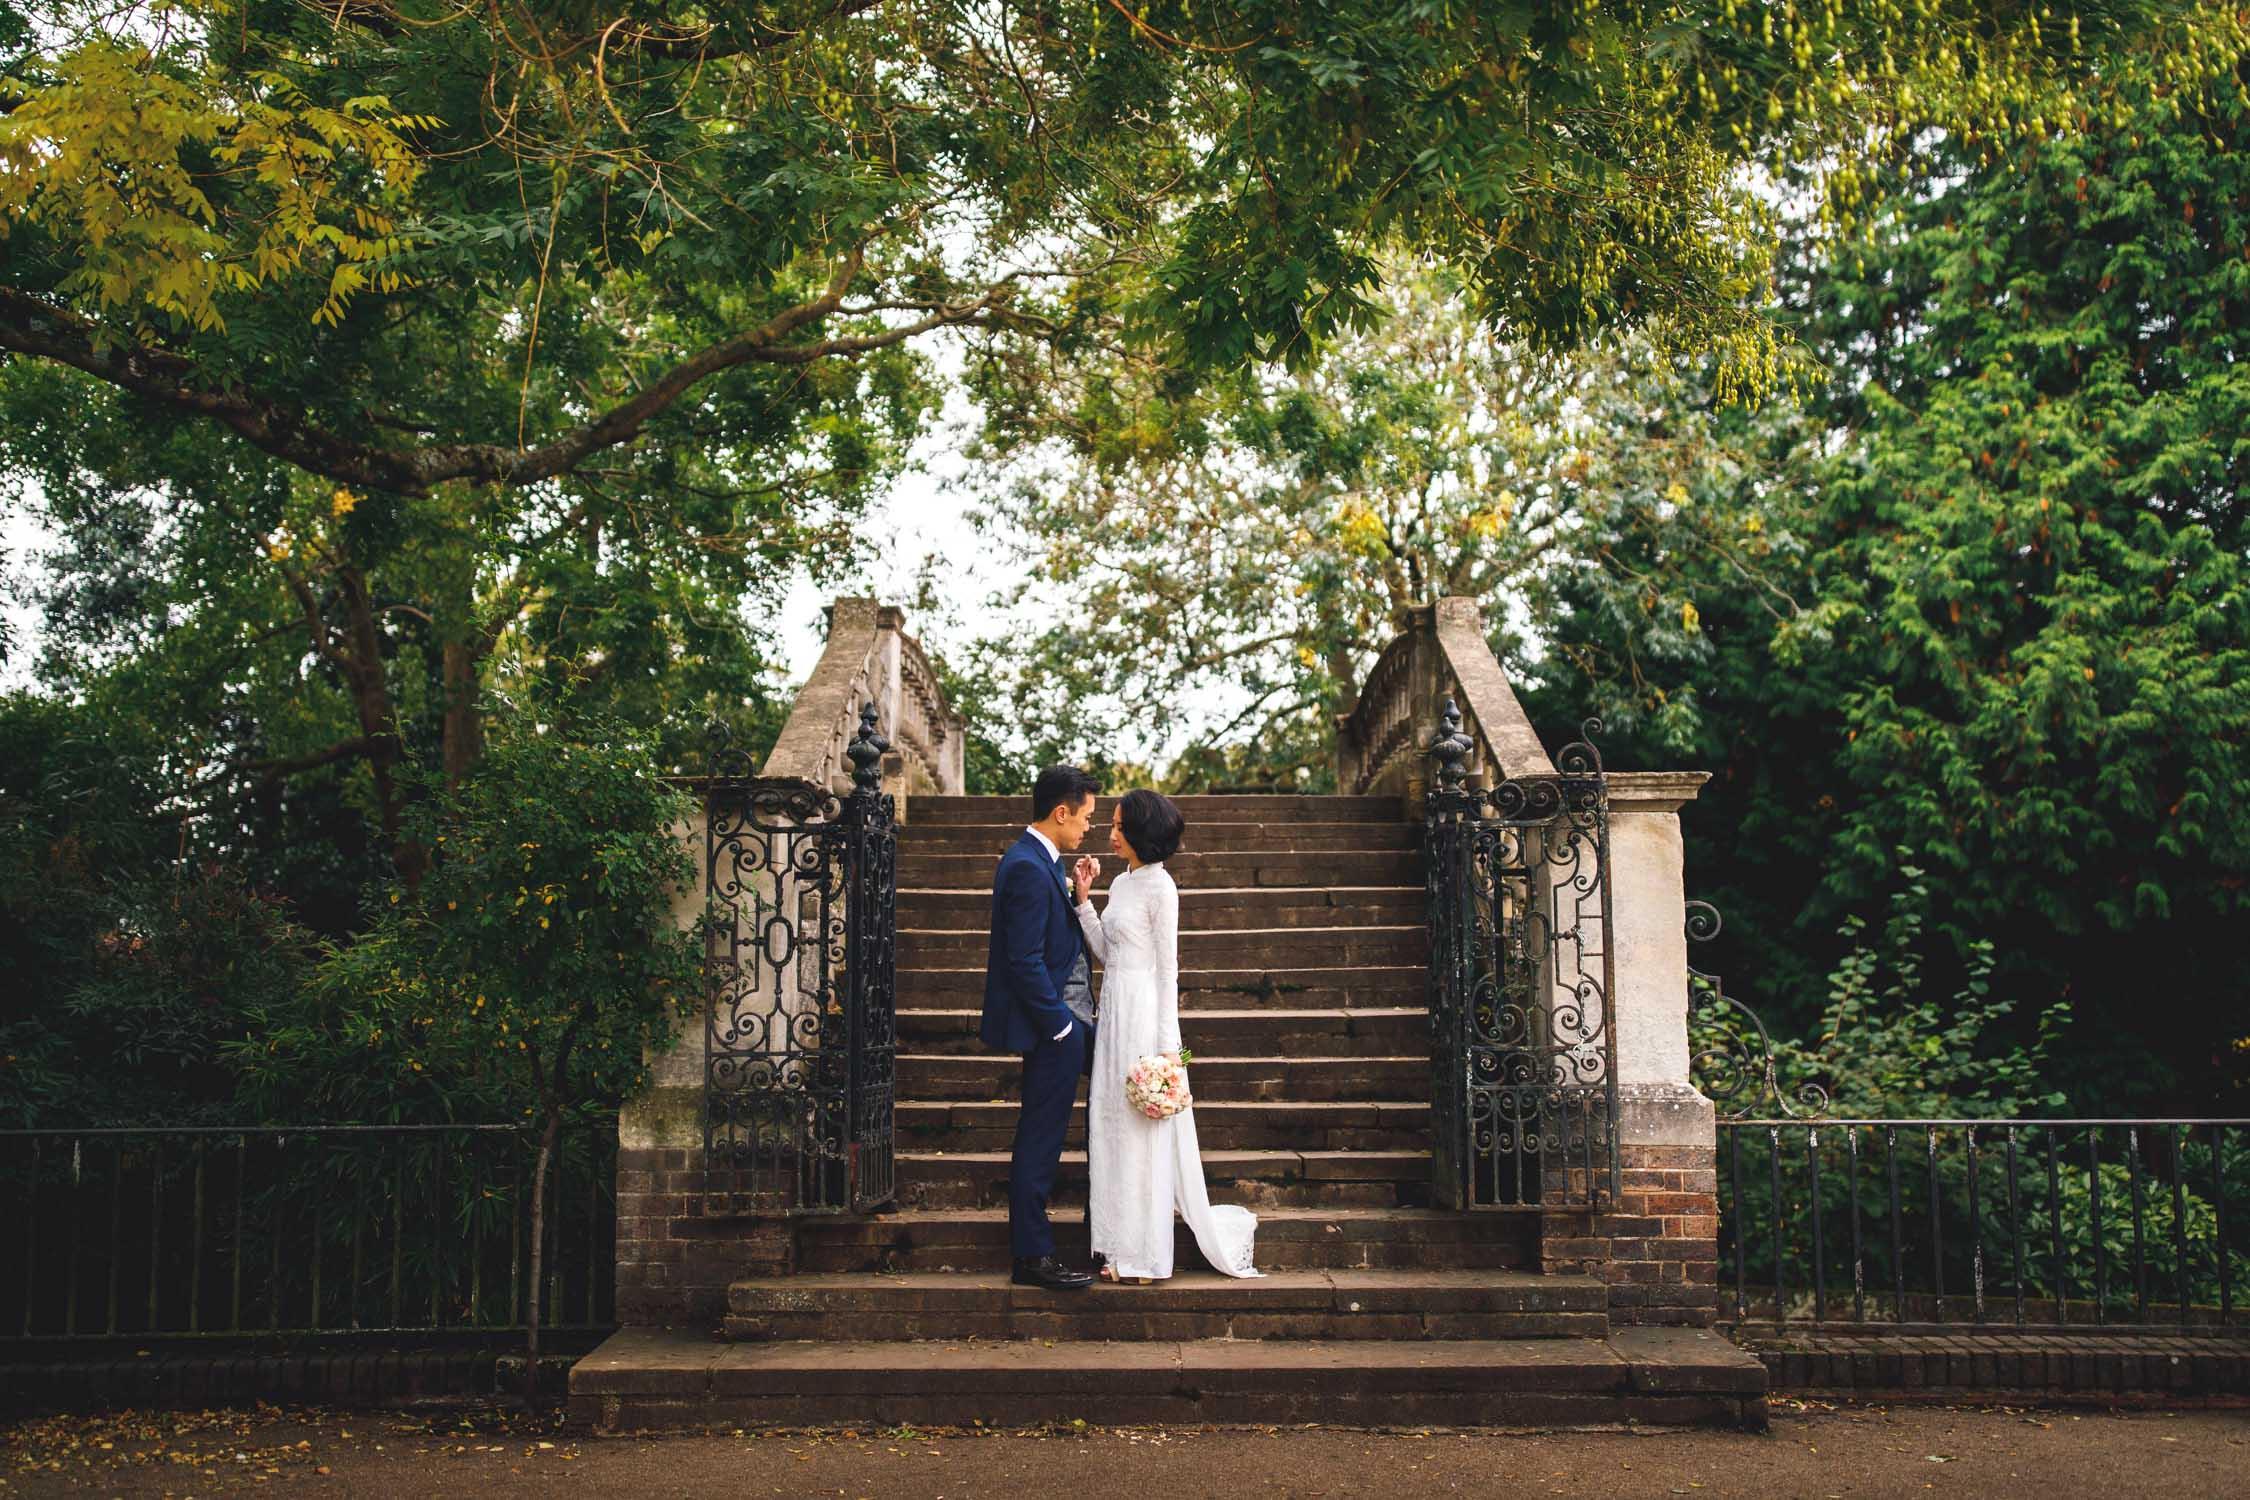 London Wedding Photography - London